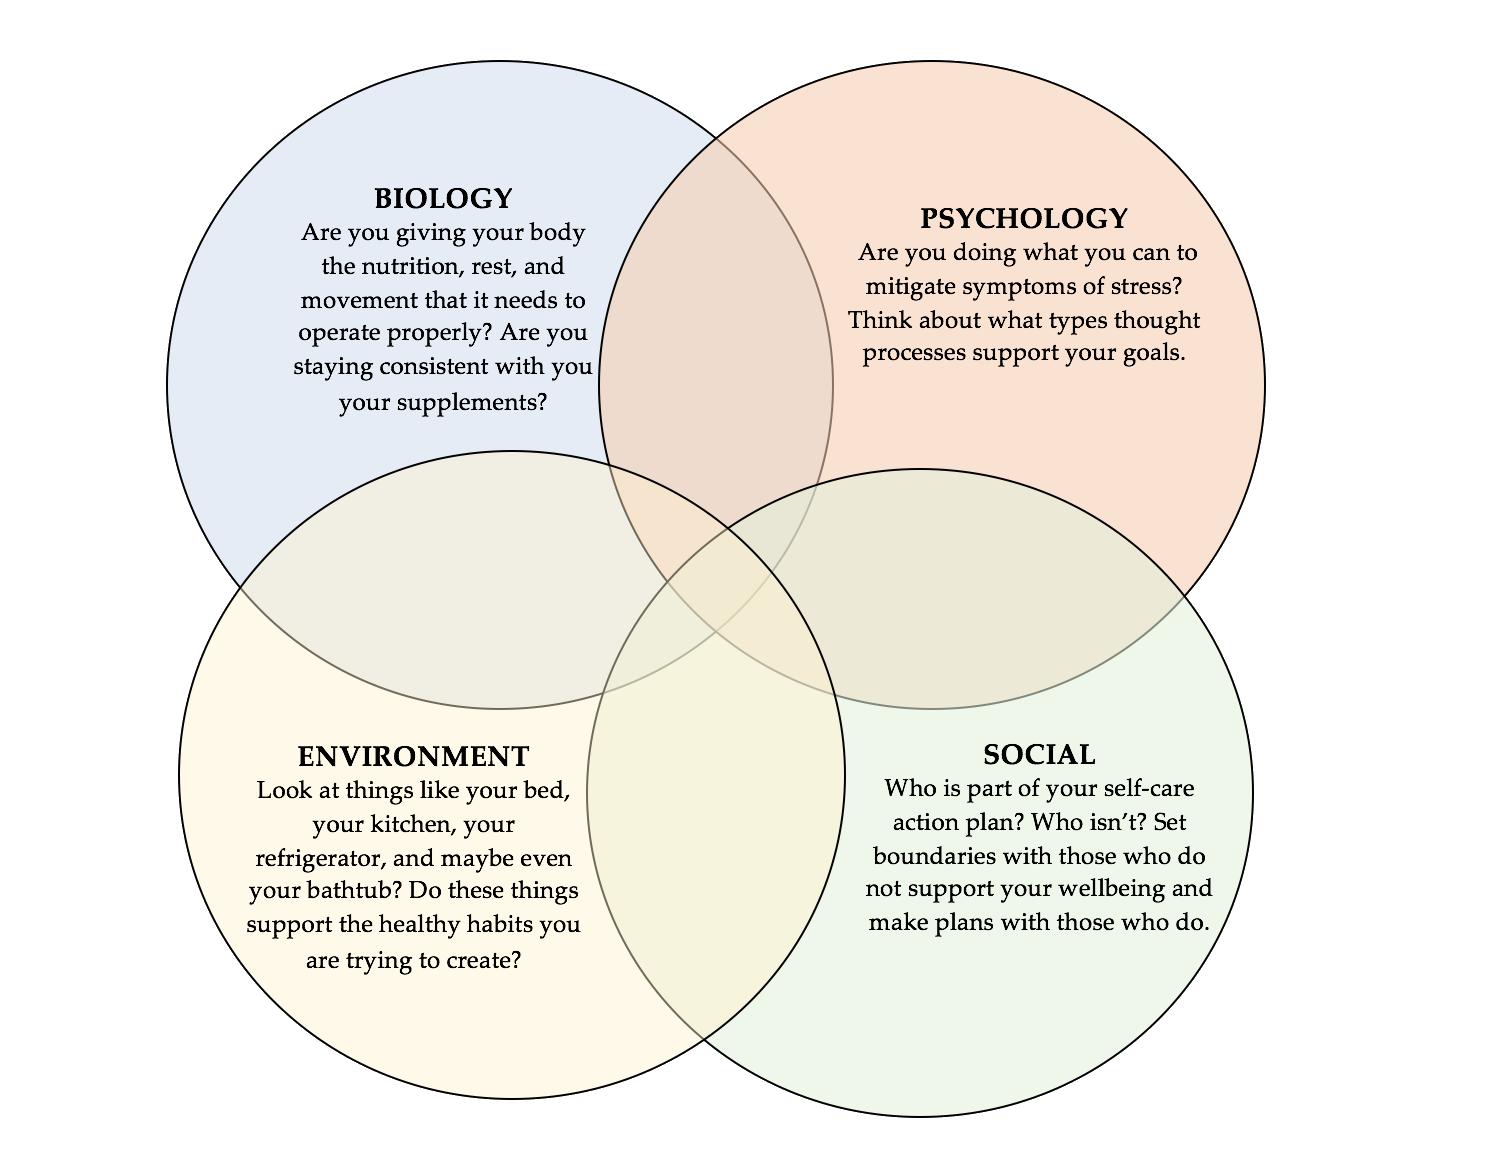 biopsychosocial_model_p4.png